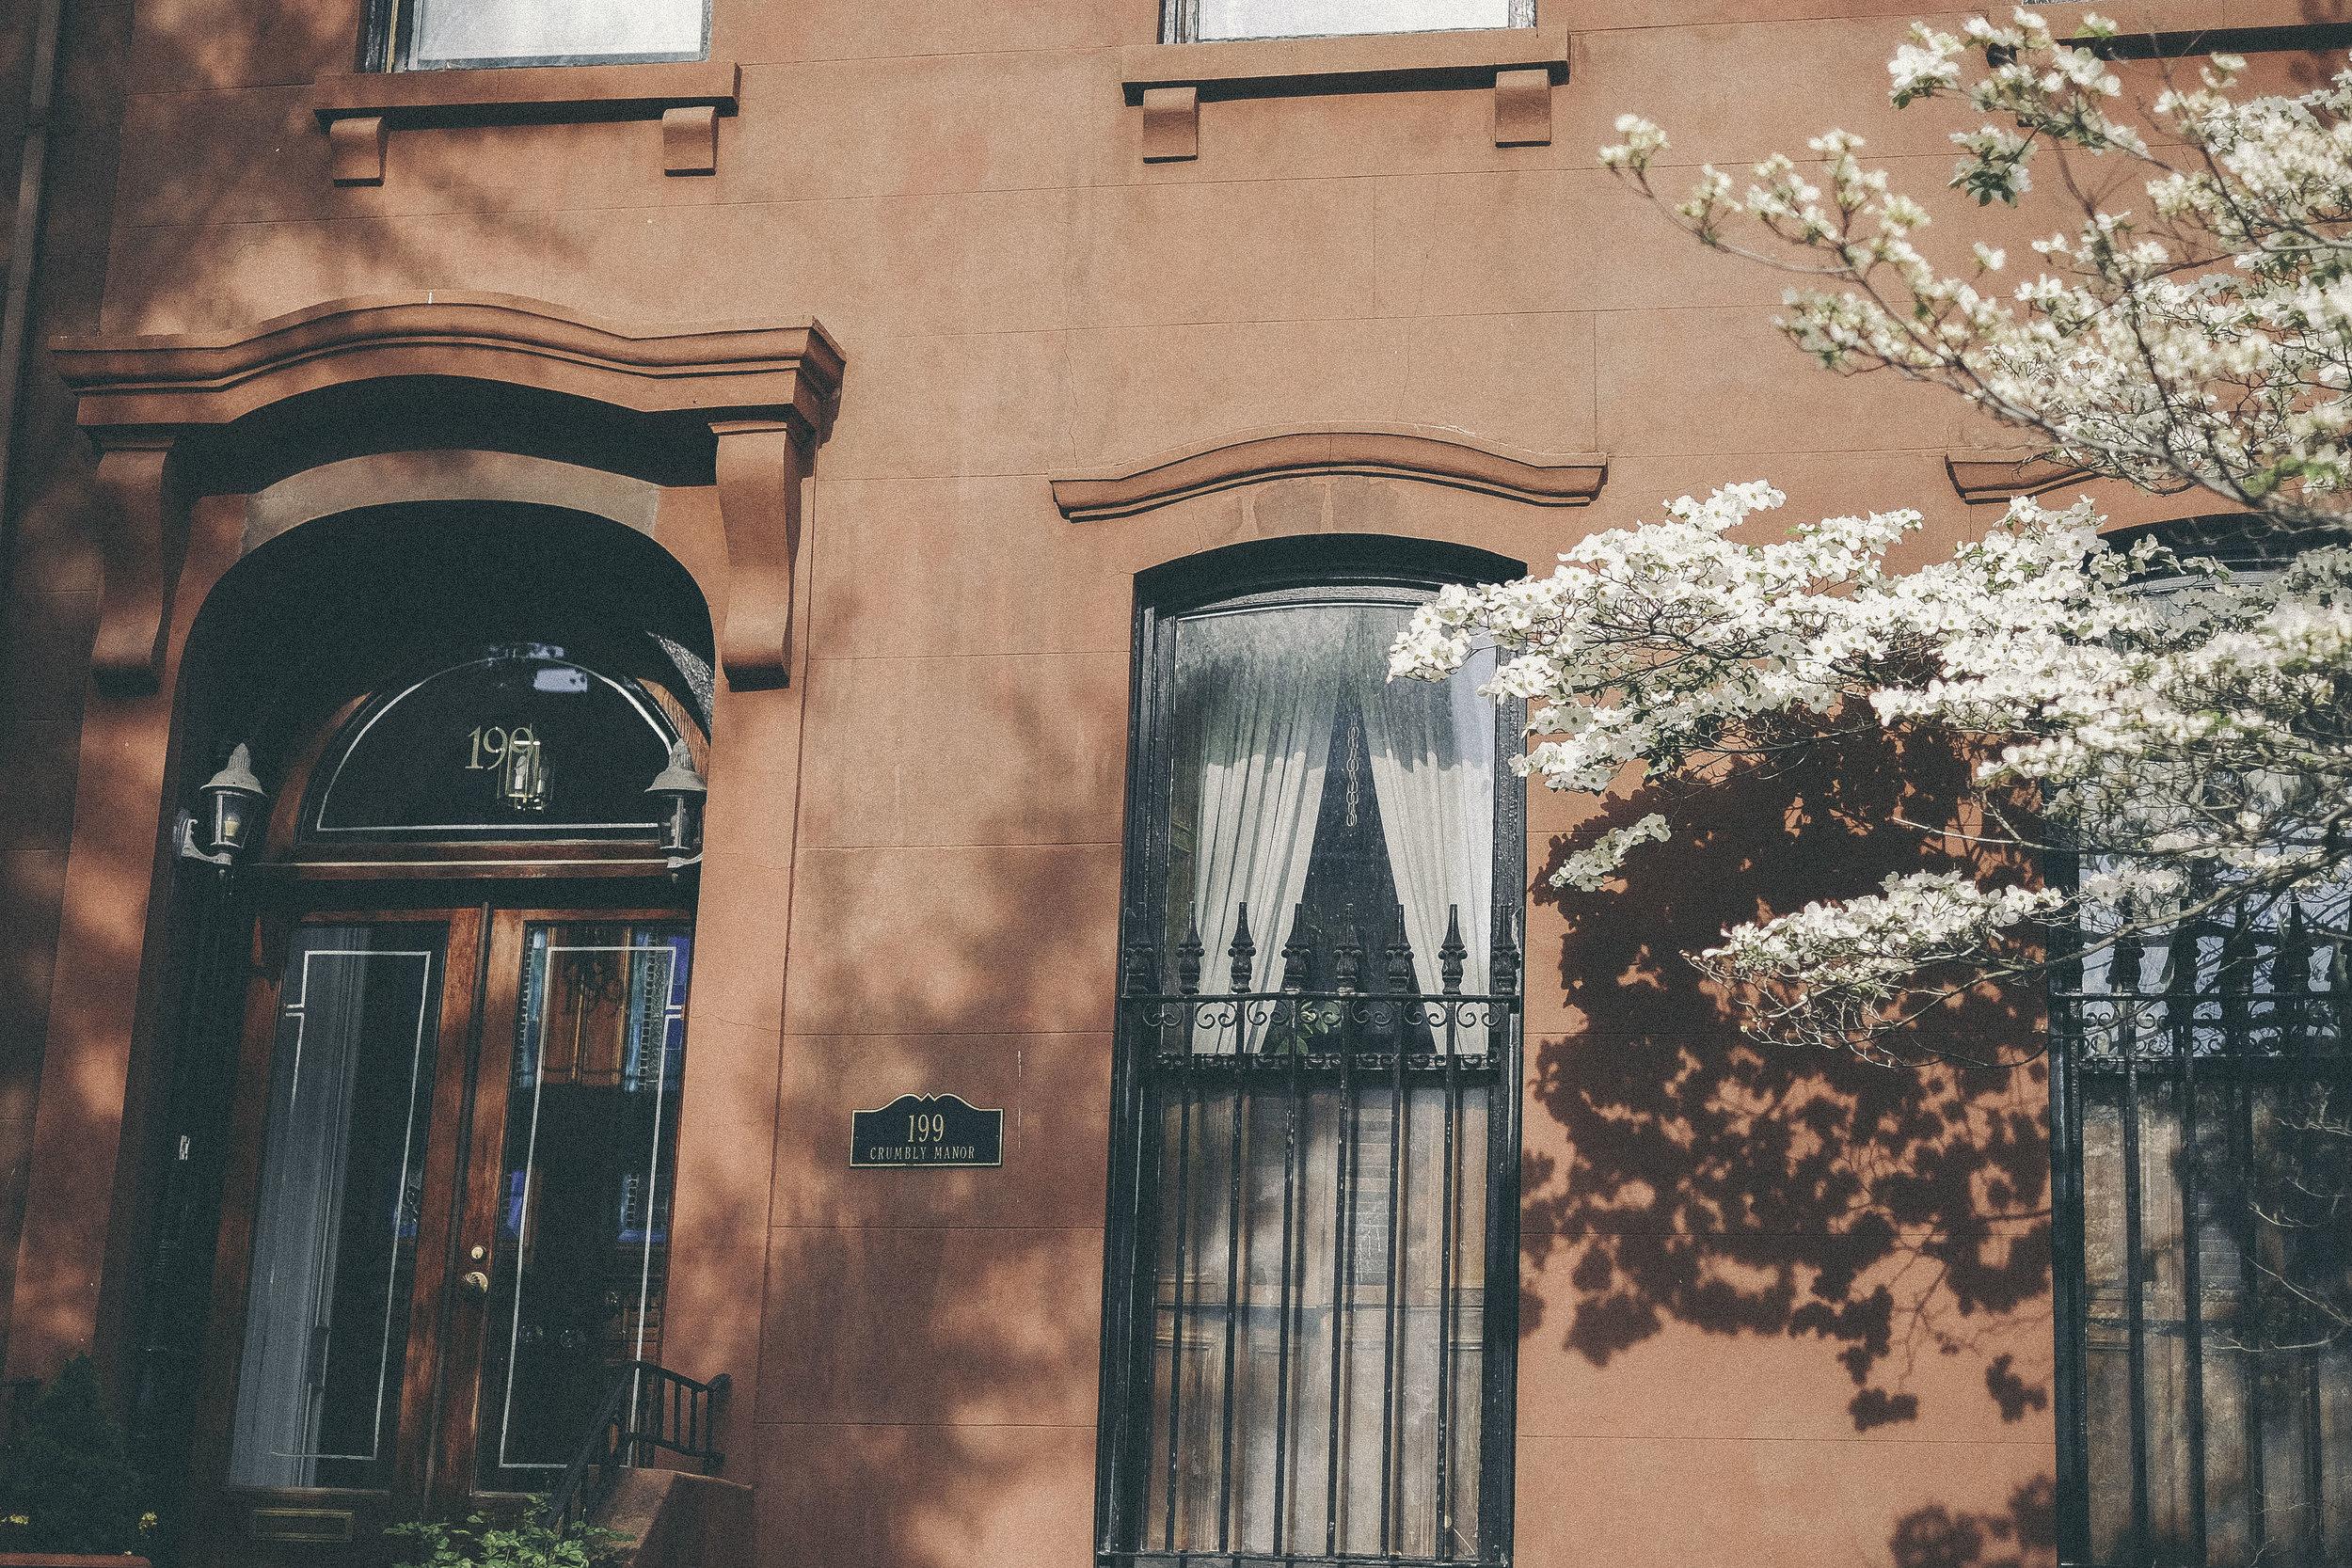 dérrive travel - BROOKLYN, new york #dumbo #newyork #nyc #brooklyn #cherryblossoms